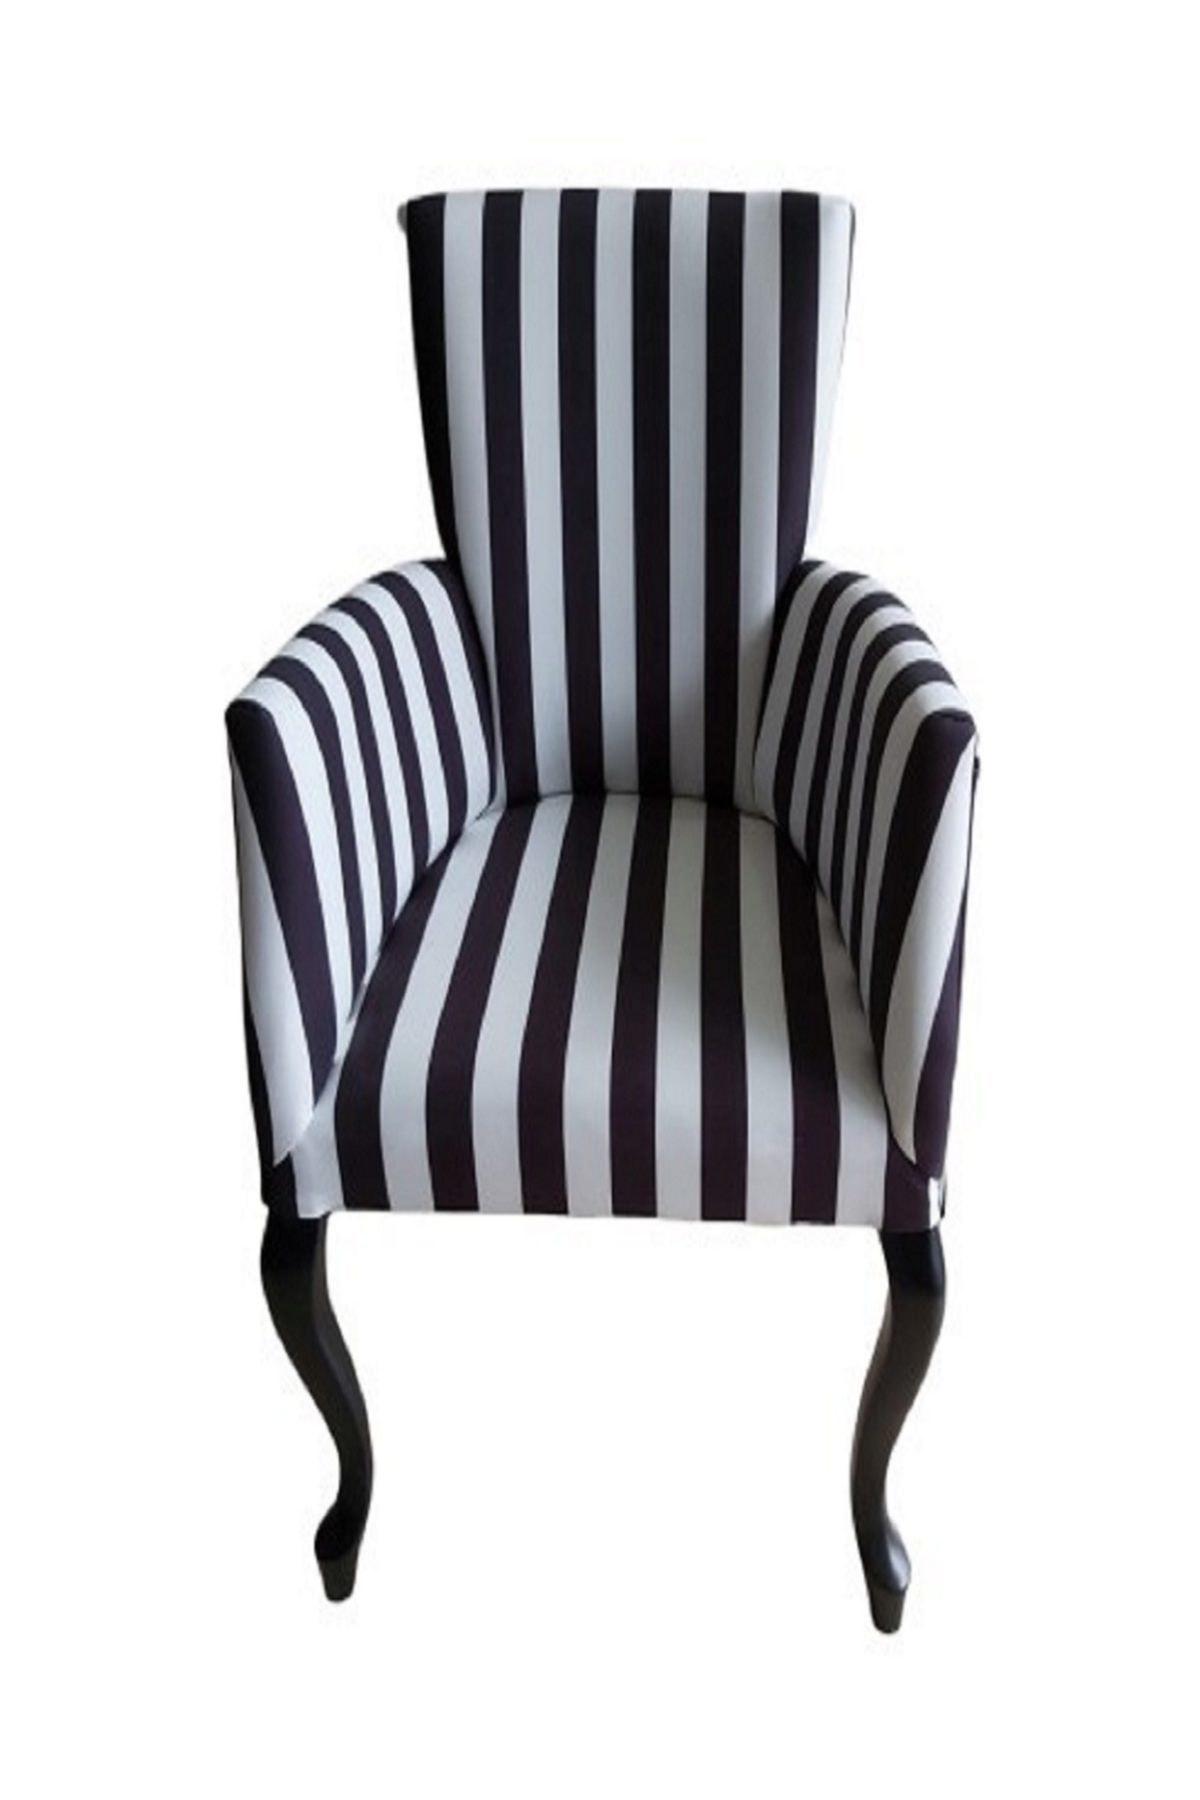 munywood Kvs Zebra Berjer Tekli Koltuk Gürgen Iskelet 1